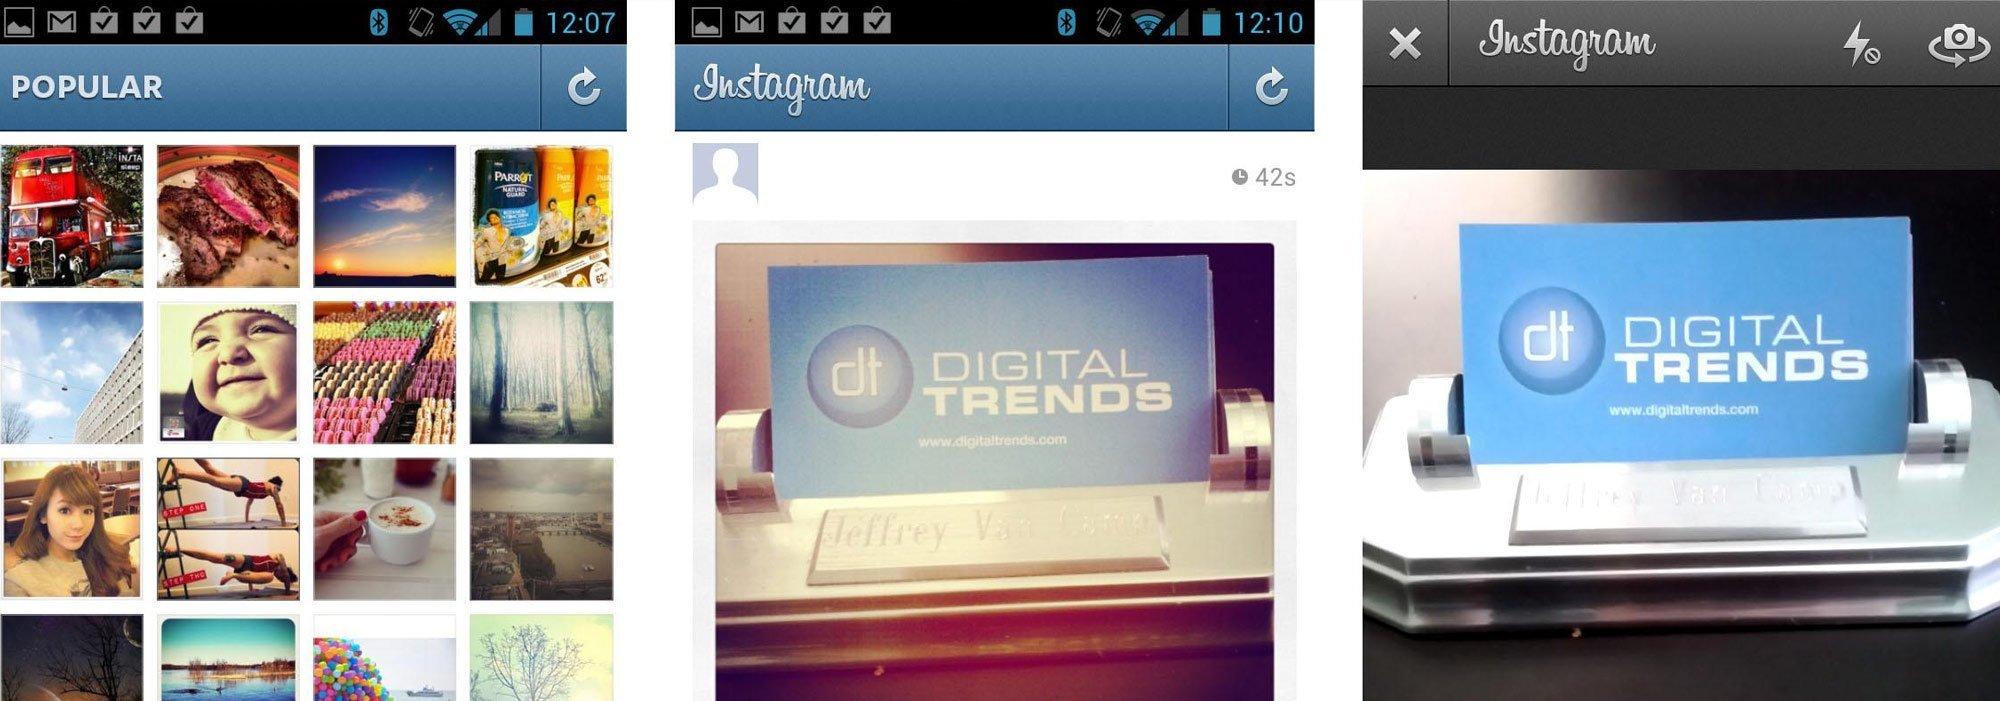 Instagram Marketing Agency - Solution Web Designs